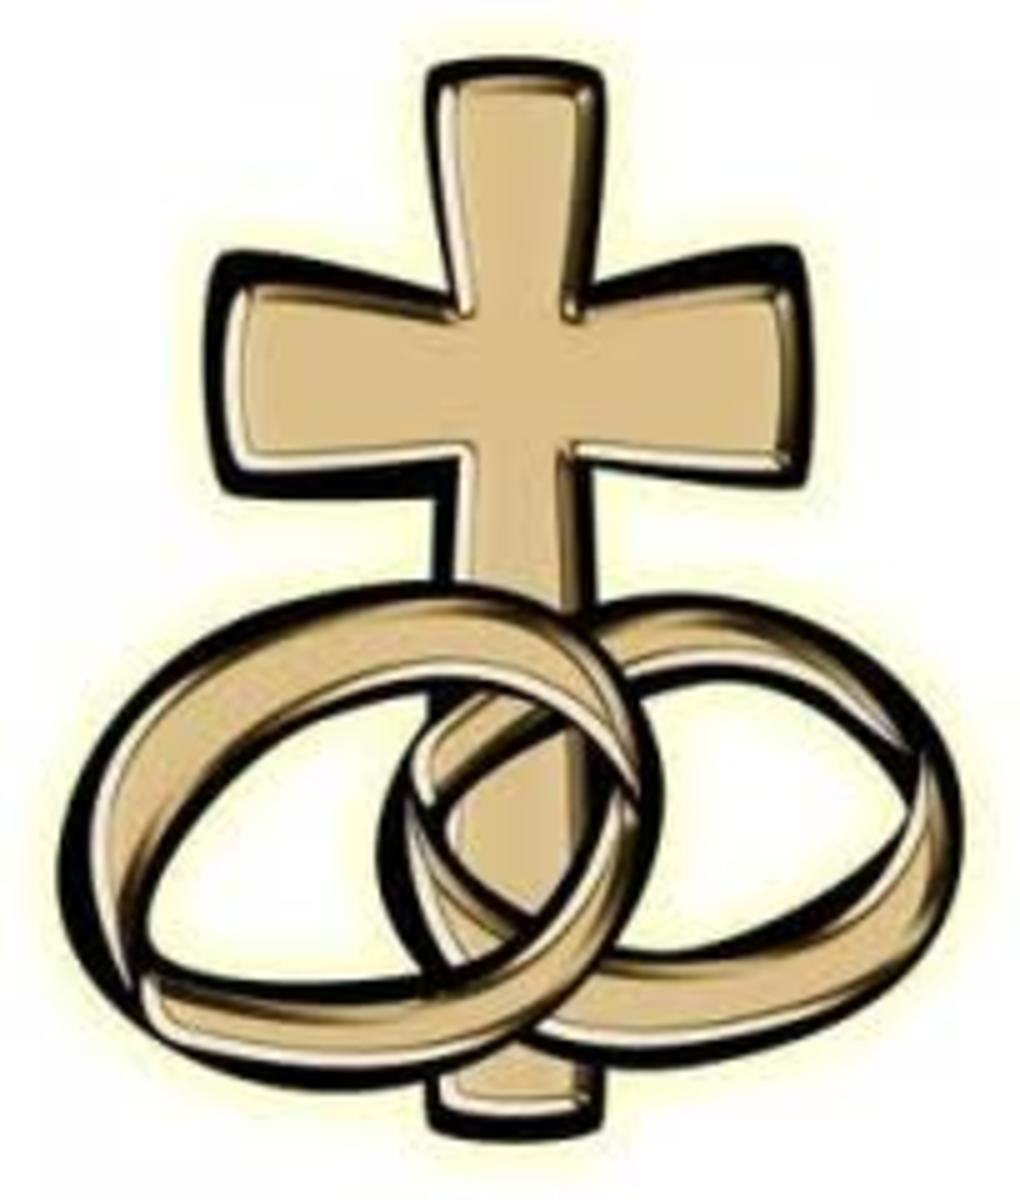 Symbolic Of Something Far Greater